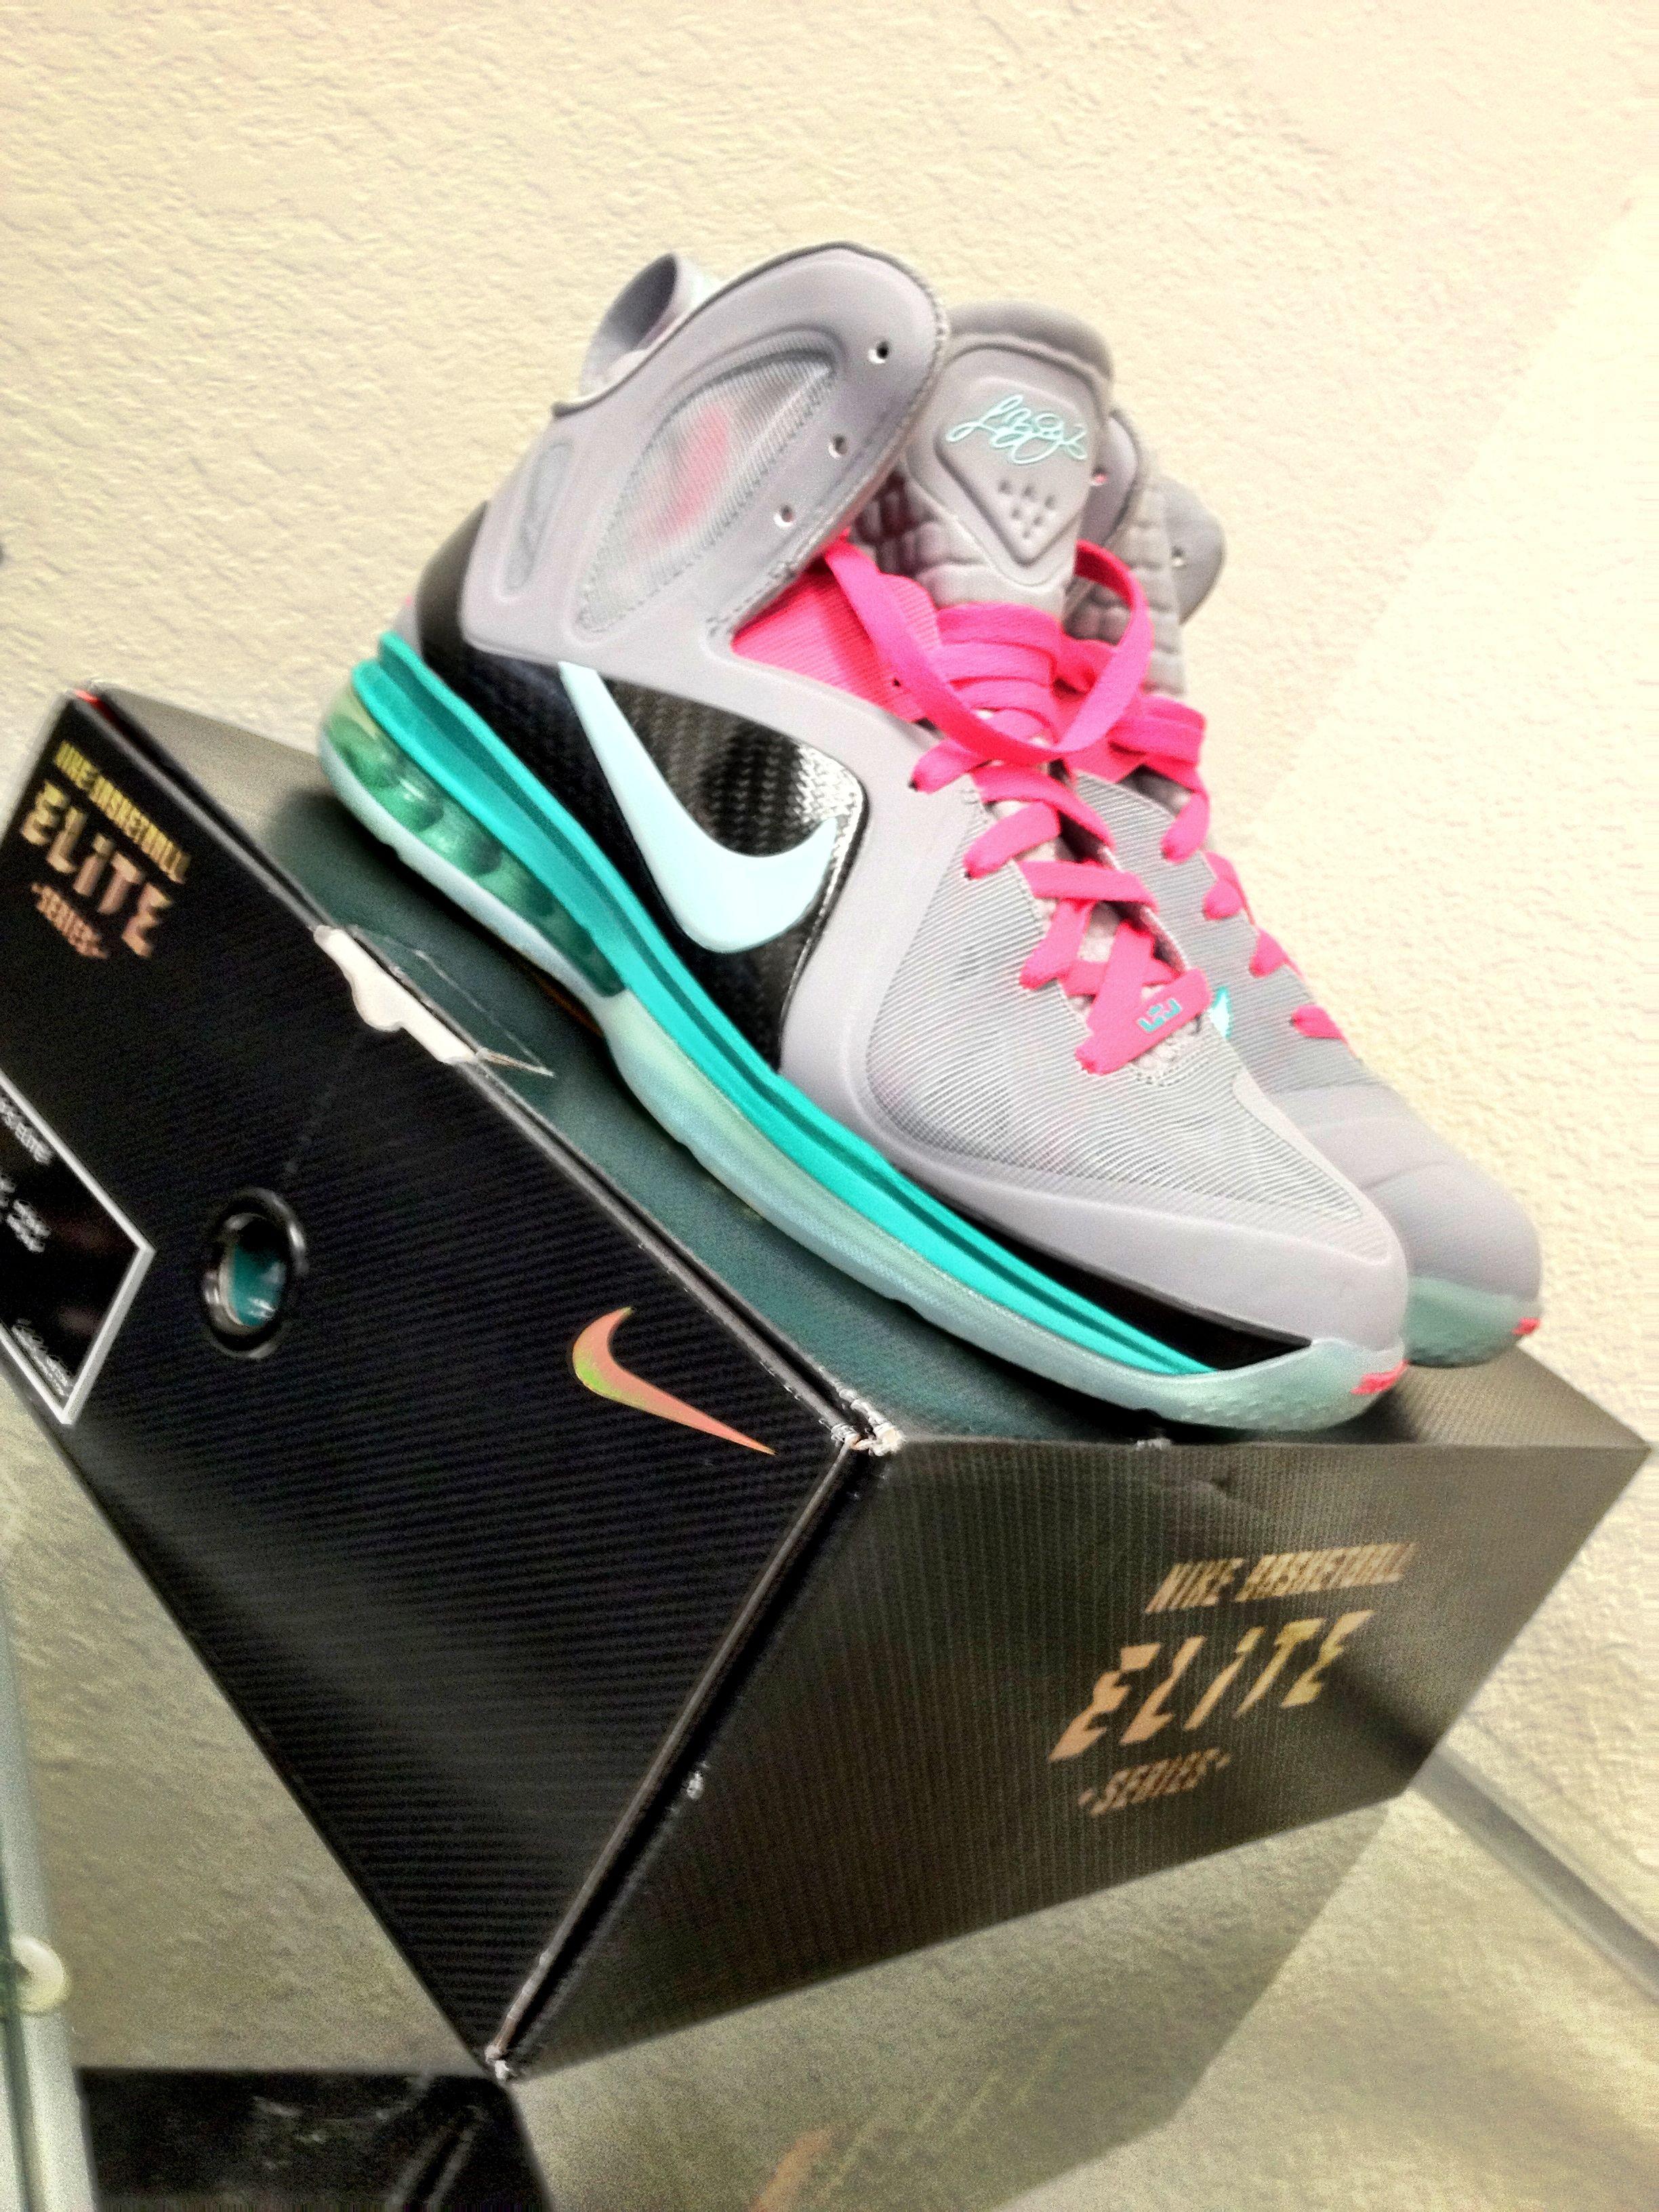 southbeach #nike #sneakers #shoes #miami #heat #lebron